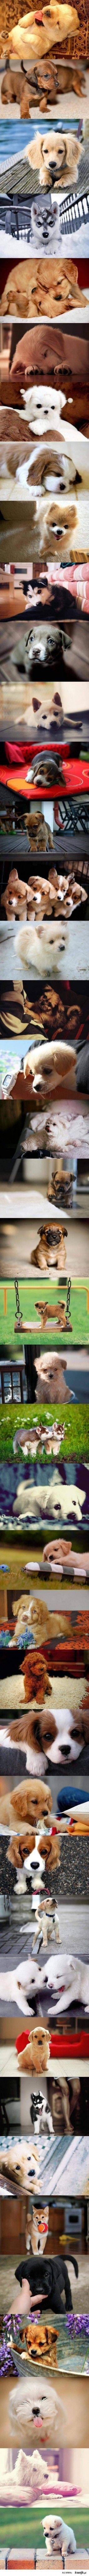 best adorable images on pinterest fluffy pets adorable